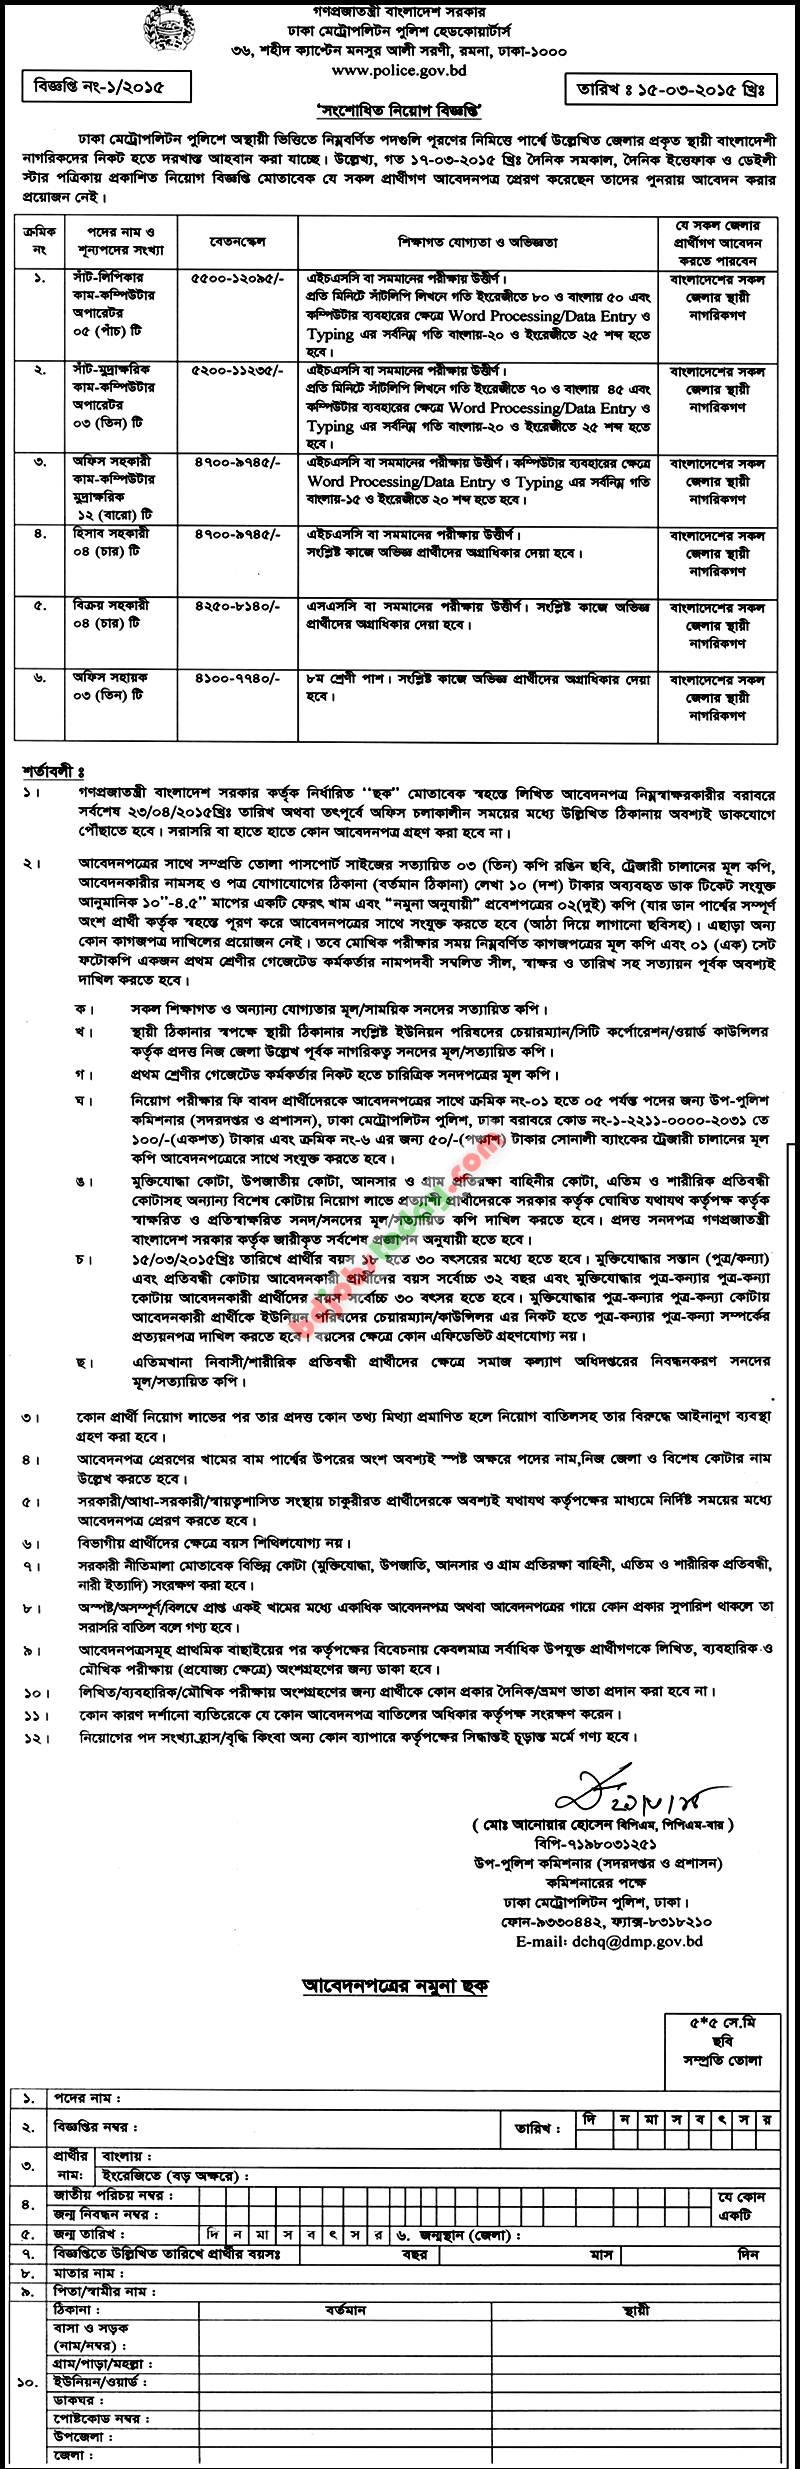 dhaka metropolitan police s assistant jobs com position s assistant dhaka metropolitan police jobs